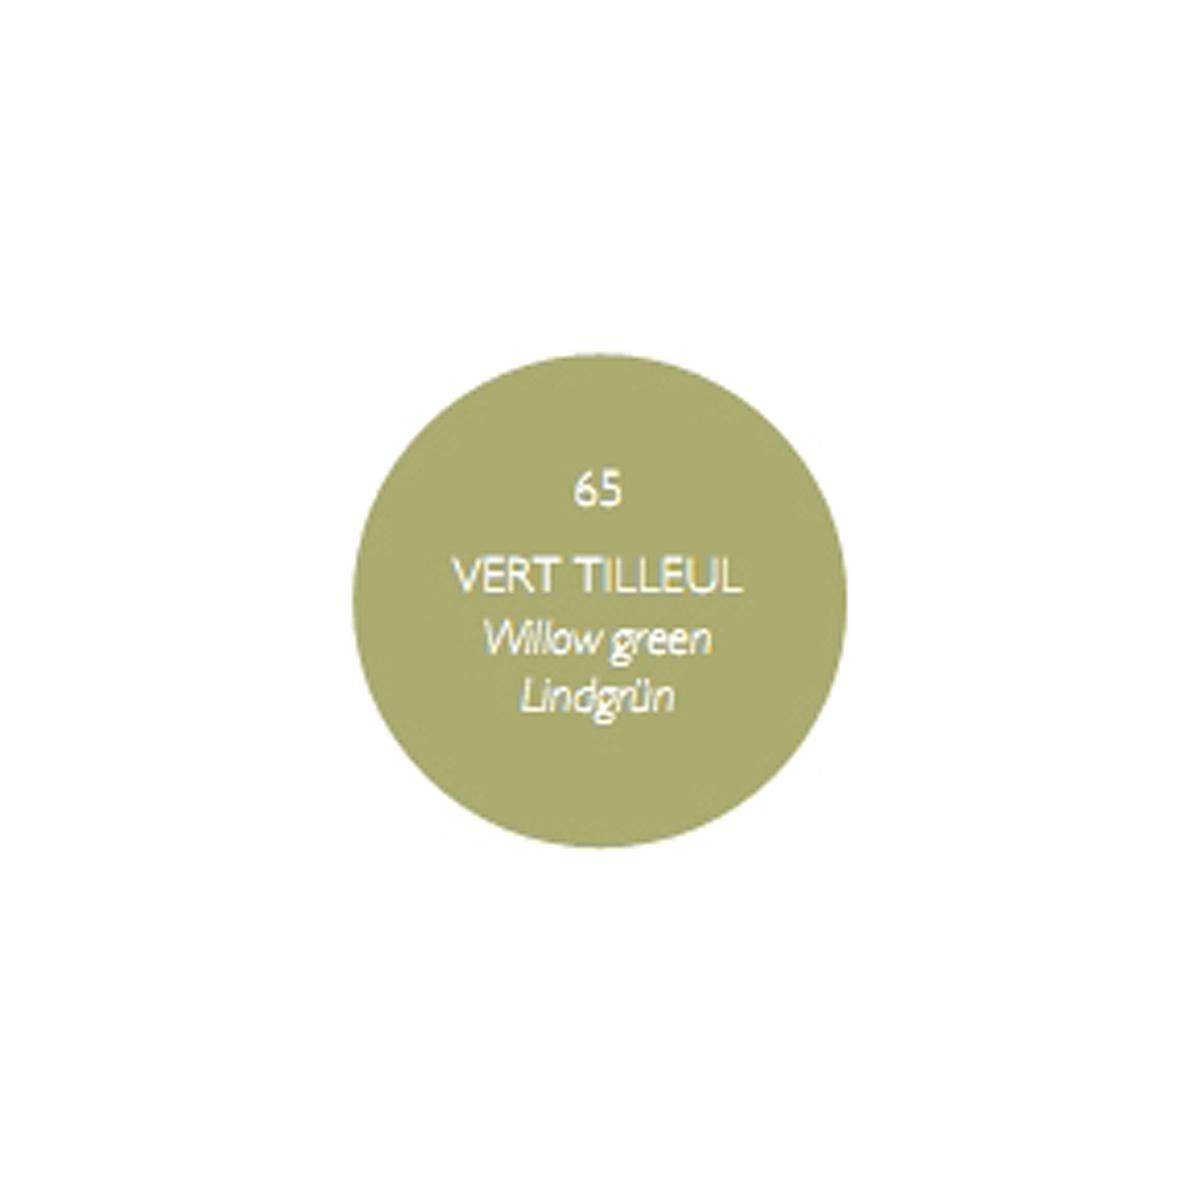 SURPRISING by Fermob Fauteuil + repose pied Vert tilleul